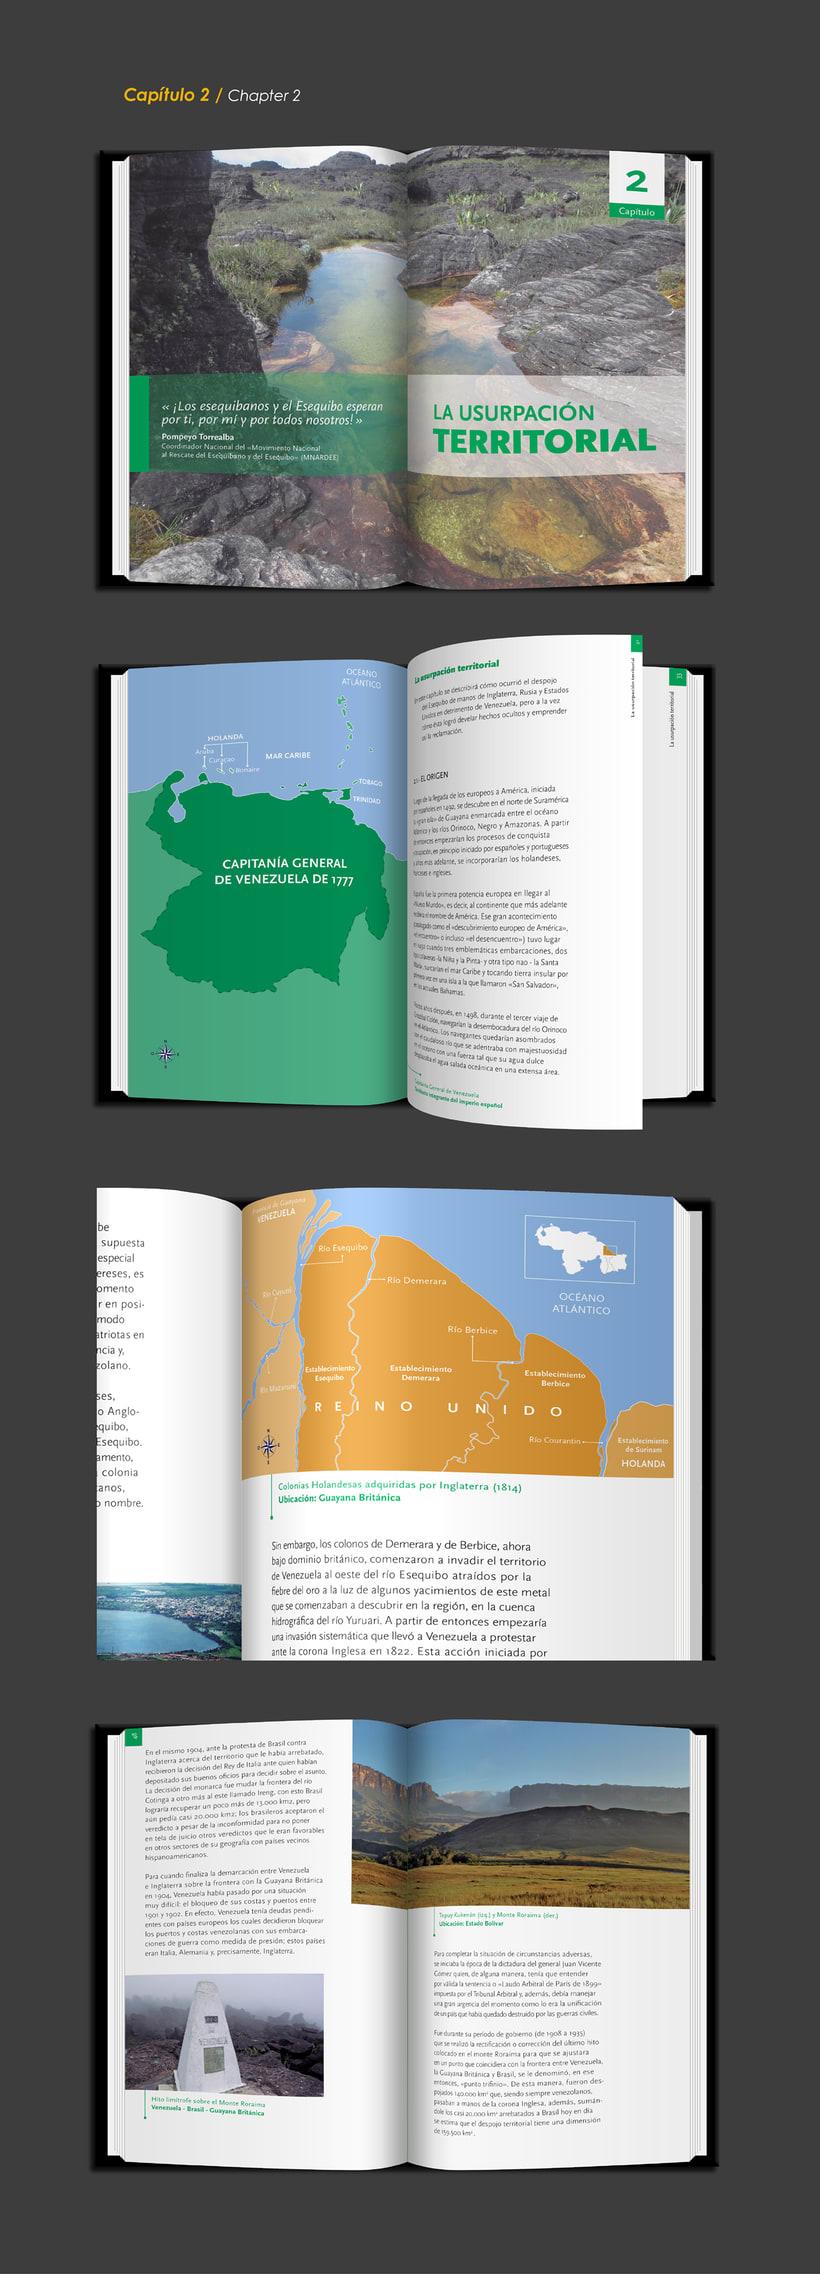 2016 | Book about the Venezuelan Essequibo 2